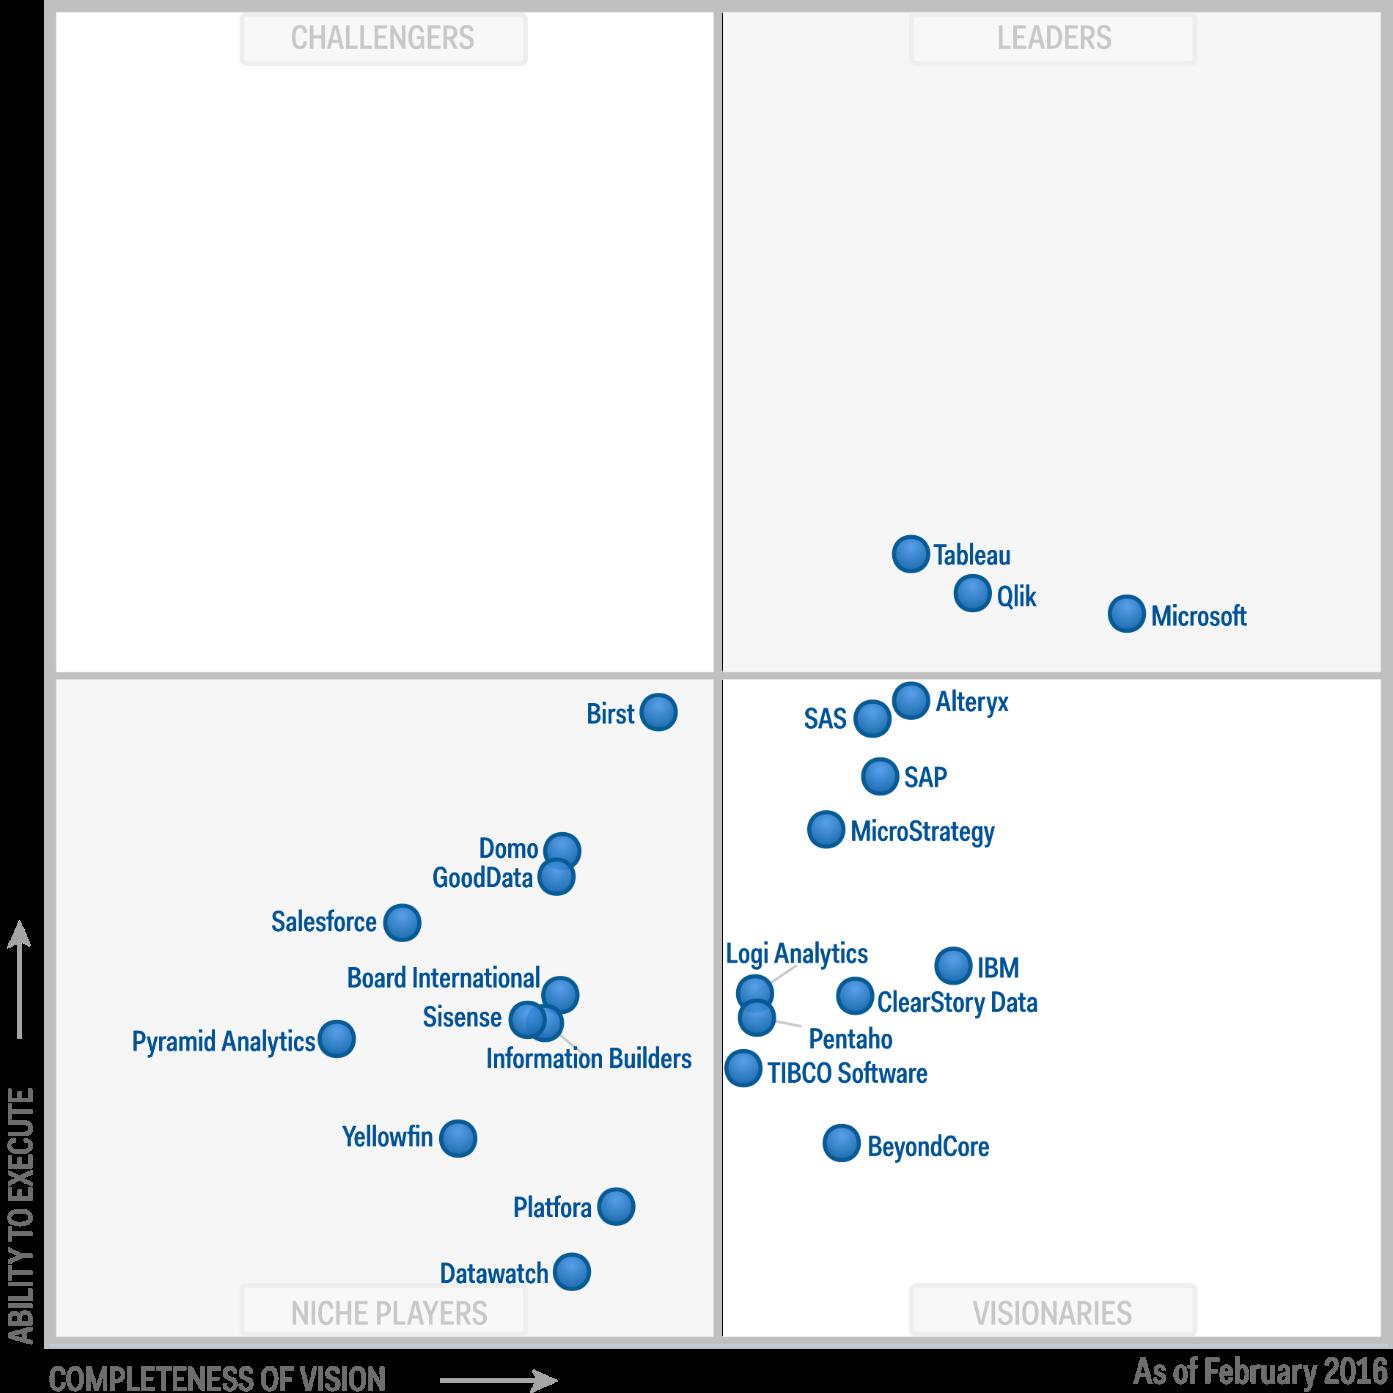 Gartner's Magic Quadrant for Business Intelligence and Analytics Platforms